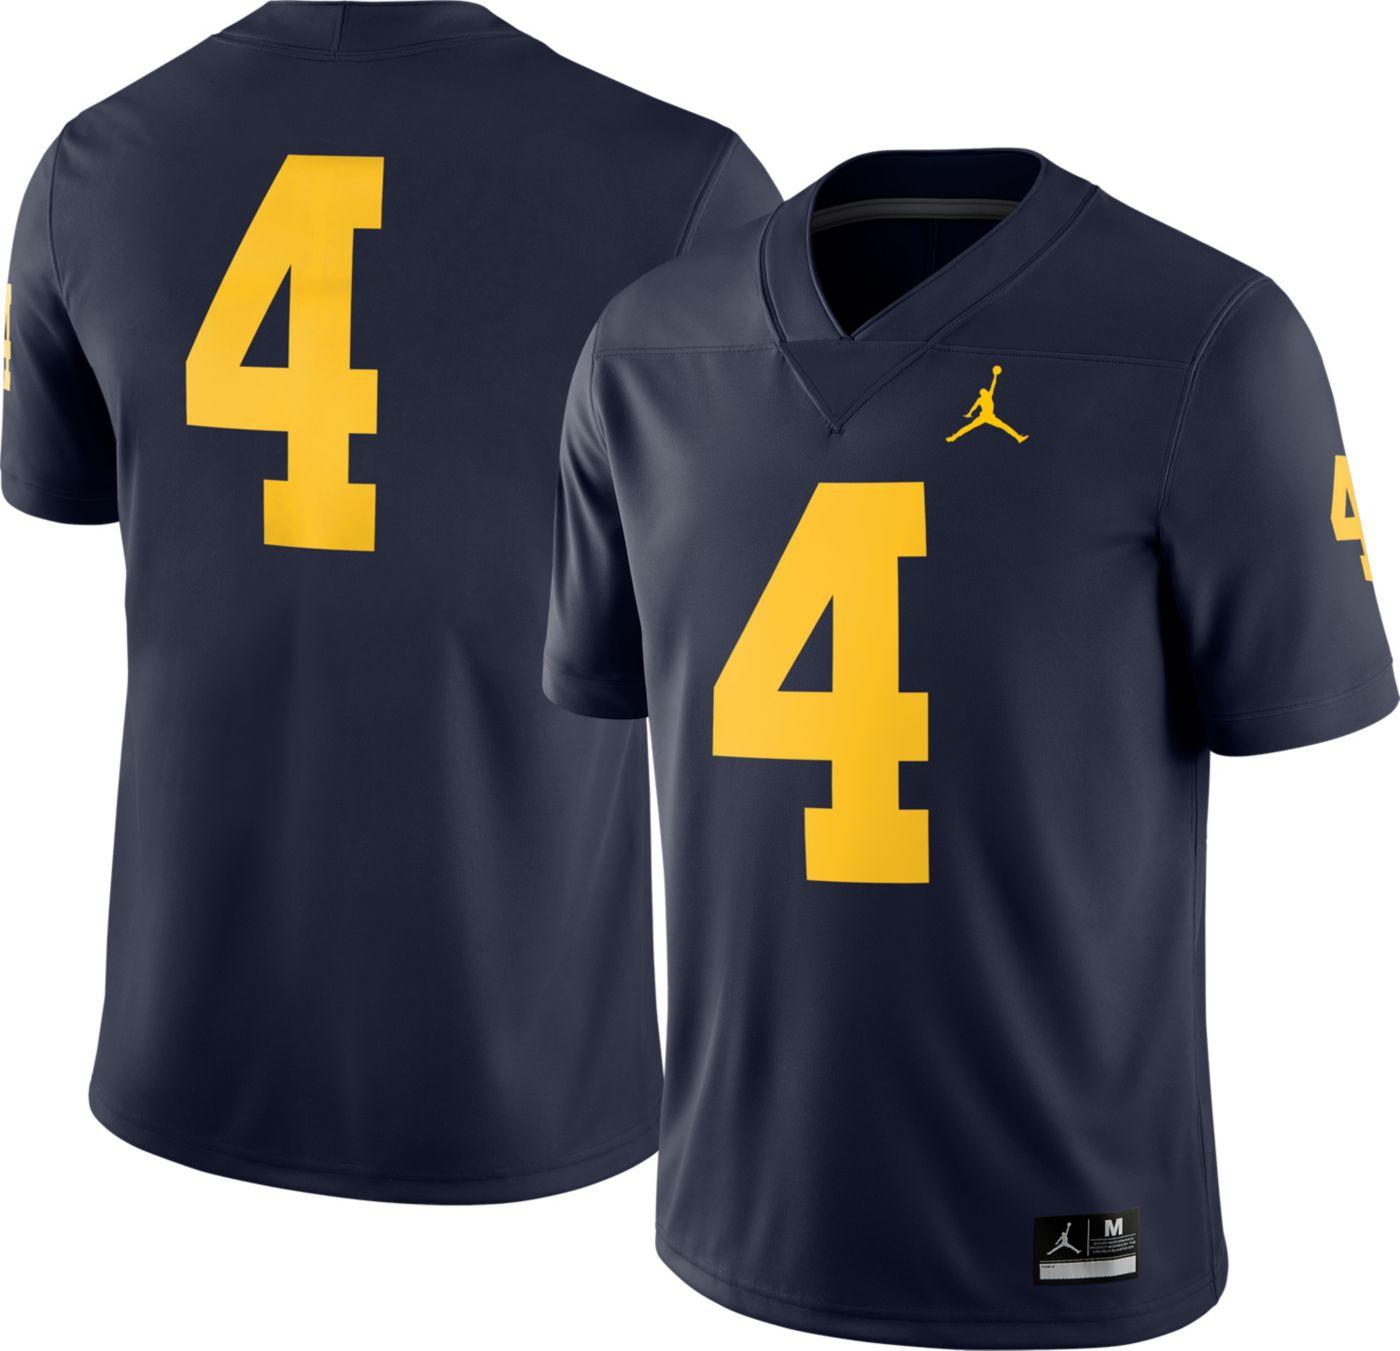 Jordan Men's Michigan Wolverines #4 Blue Dri-FIT Game Football Jersey